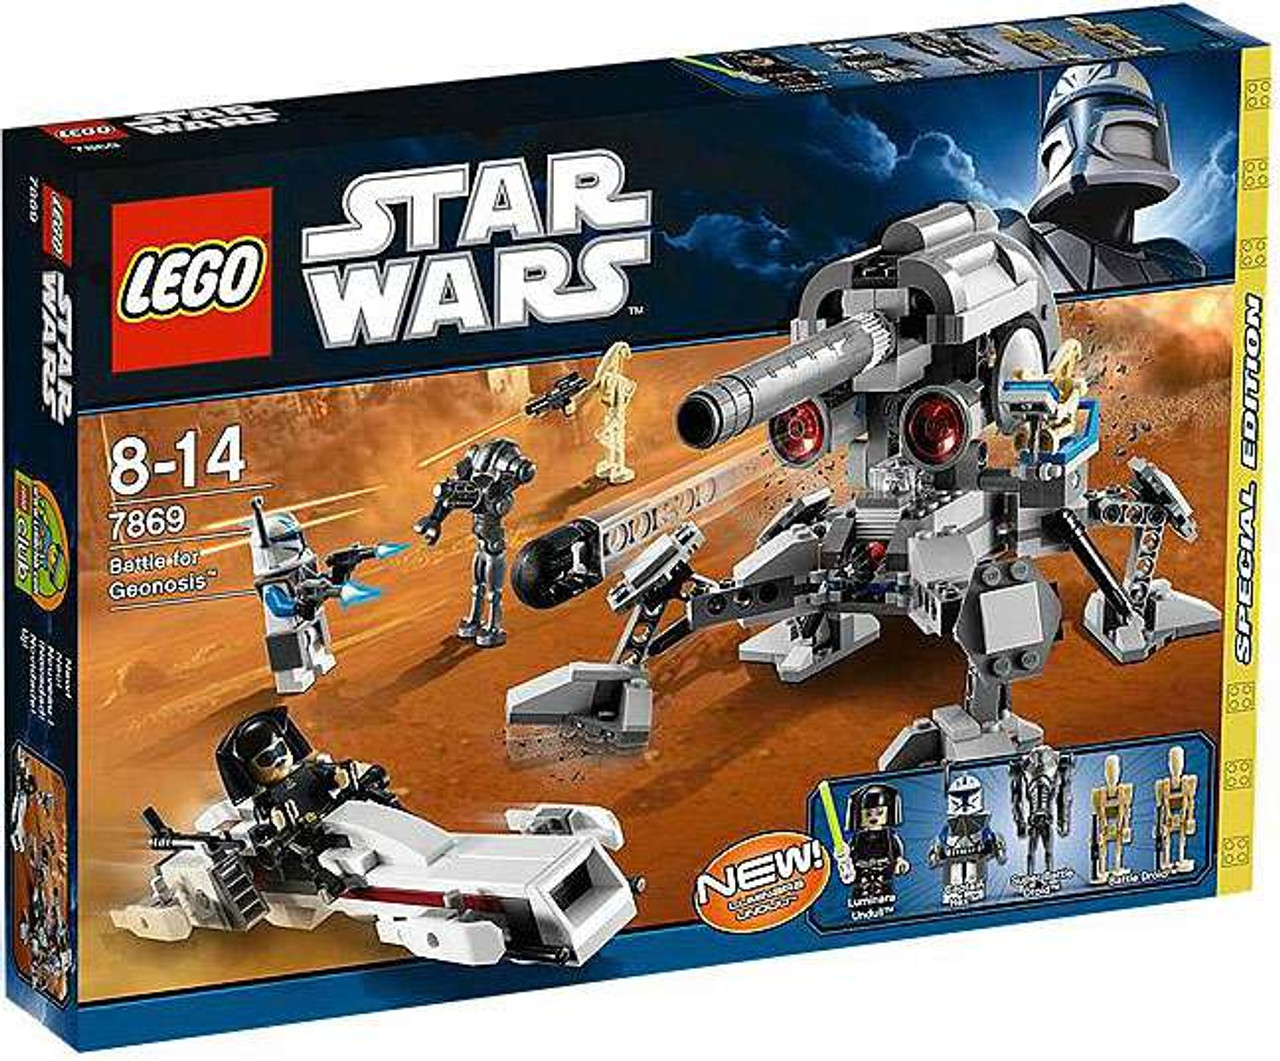 NEW! BRICKMASTER SUBSCRIPTION EXCLUSIVE SET 2011 LEGO STAR WARS 20019 SLAVE I